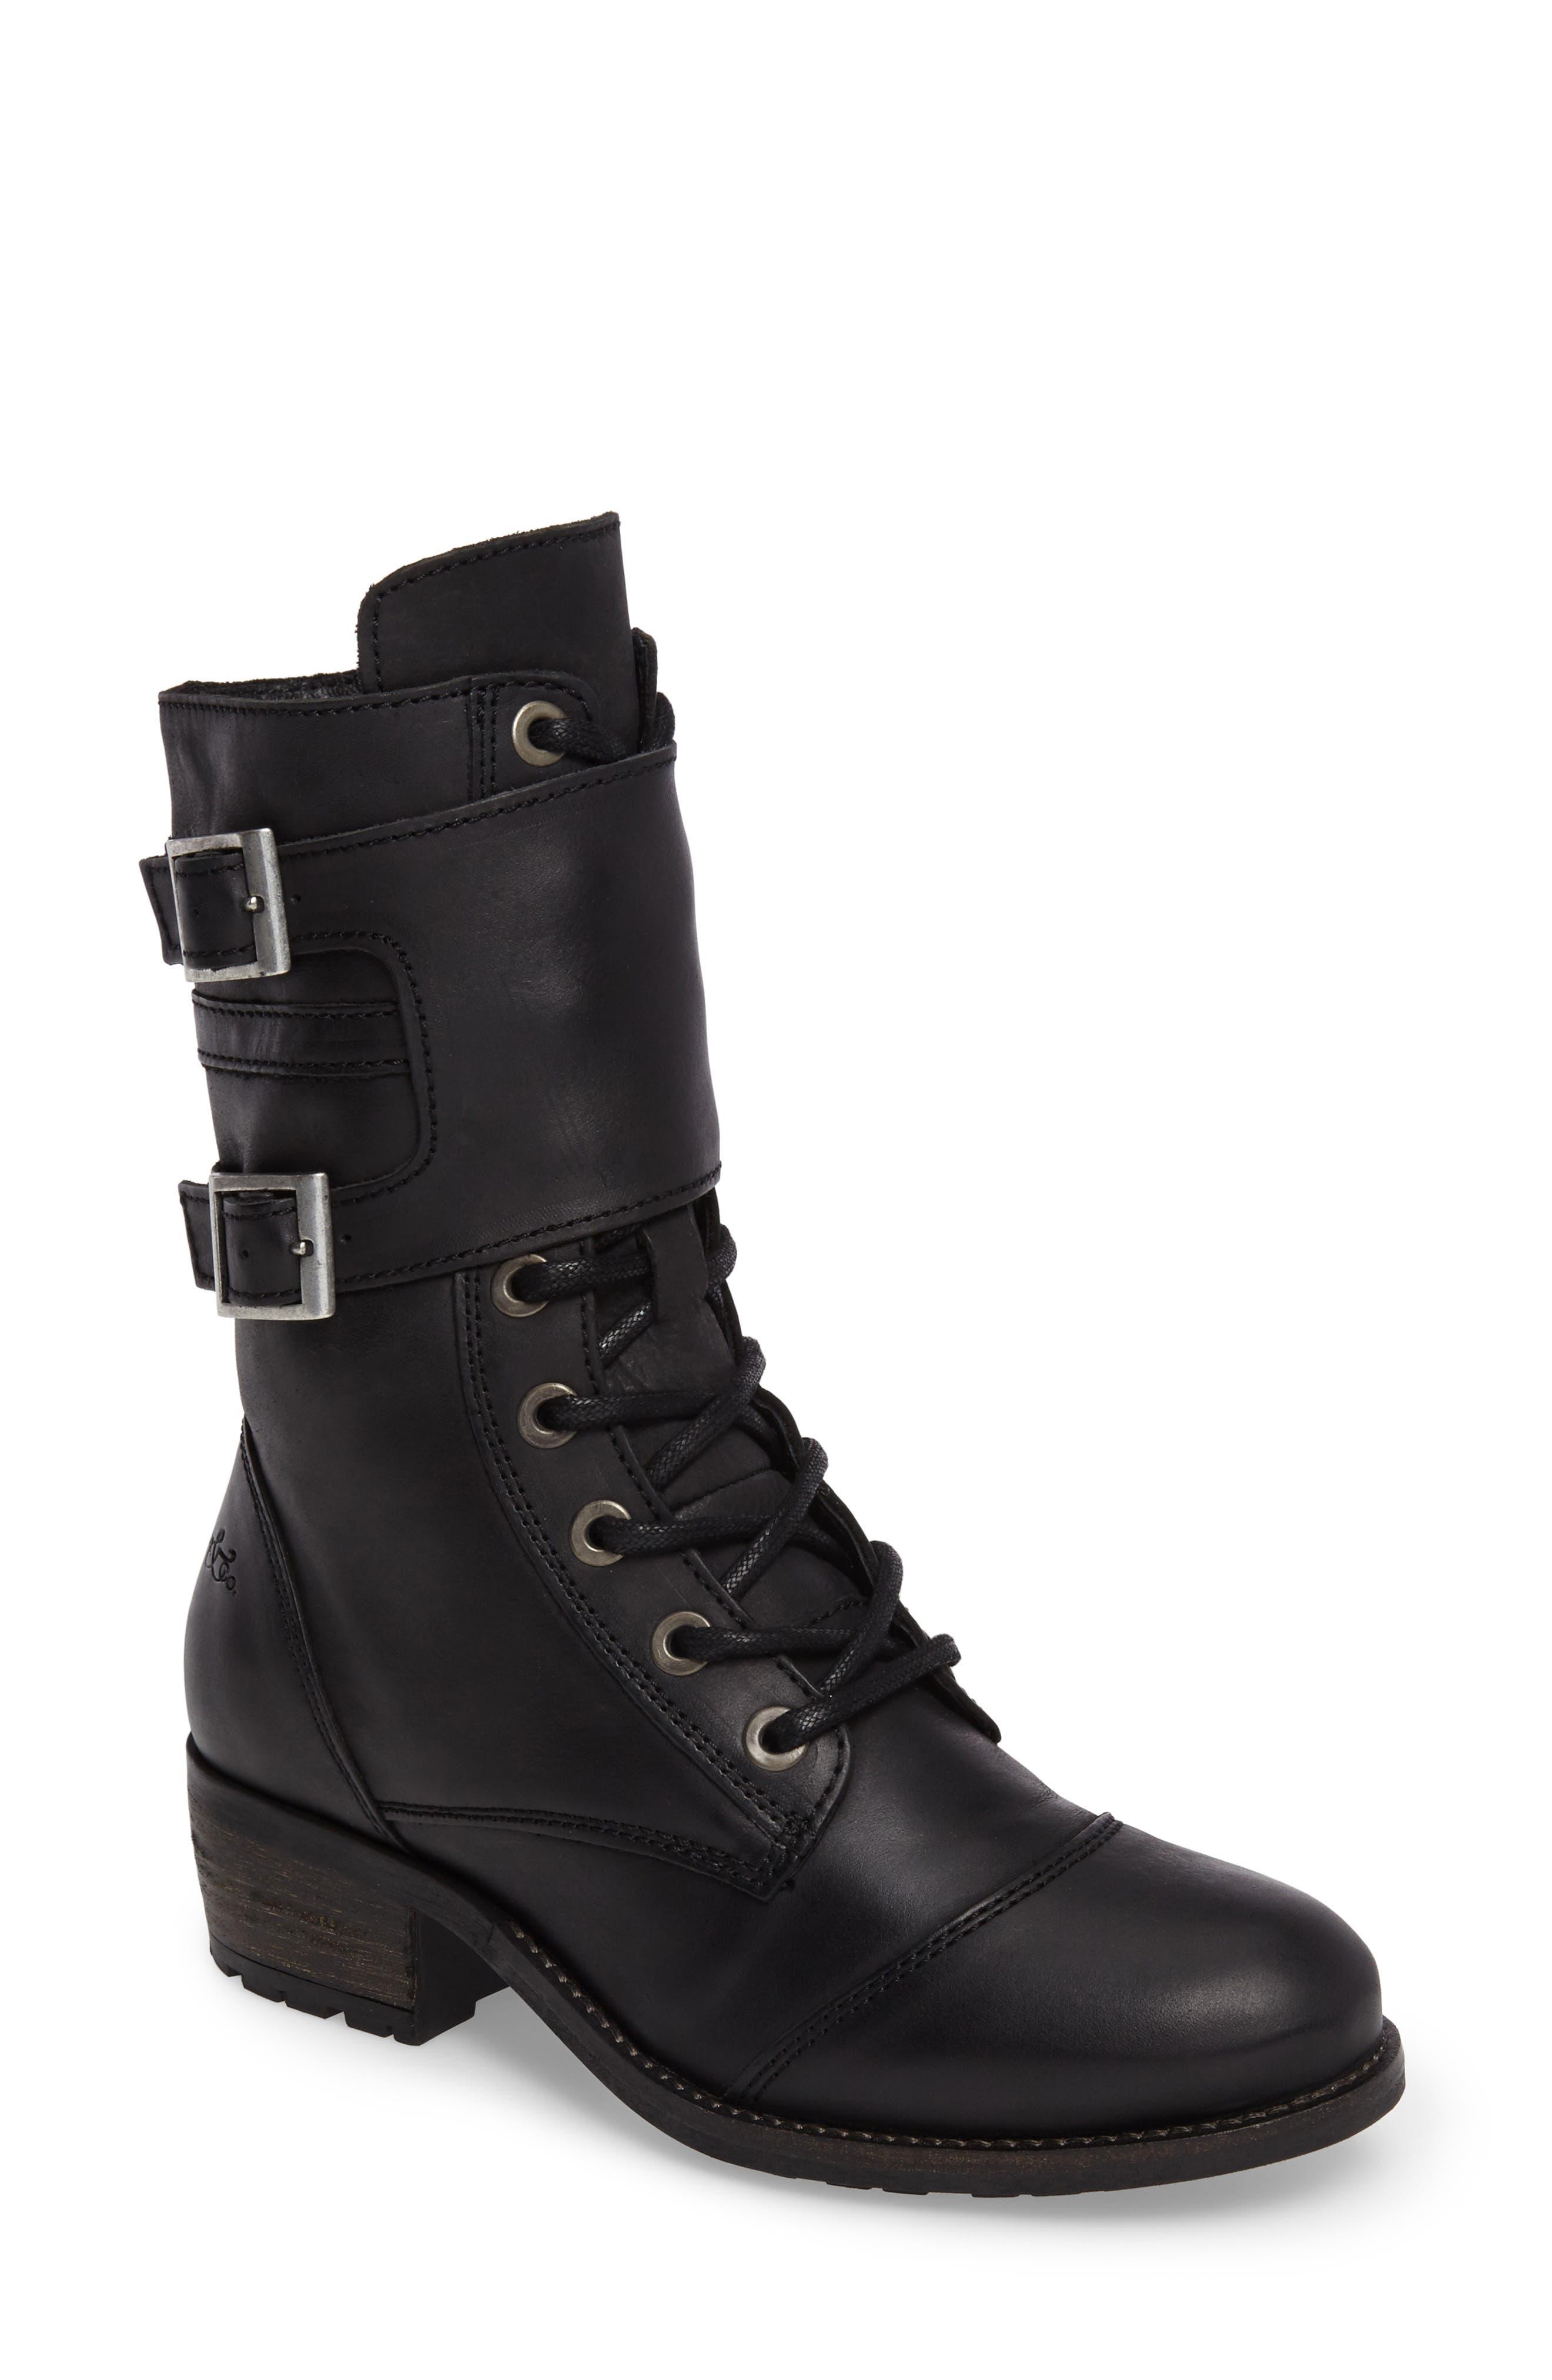 Lune Waterproof Moto Boot,                             Main thumbnail 1, color,                             Black Varese Leather